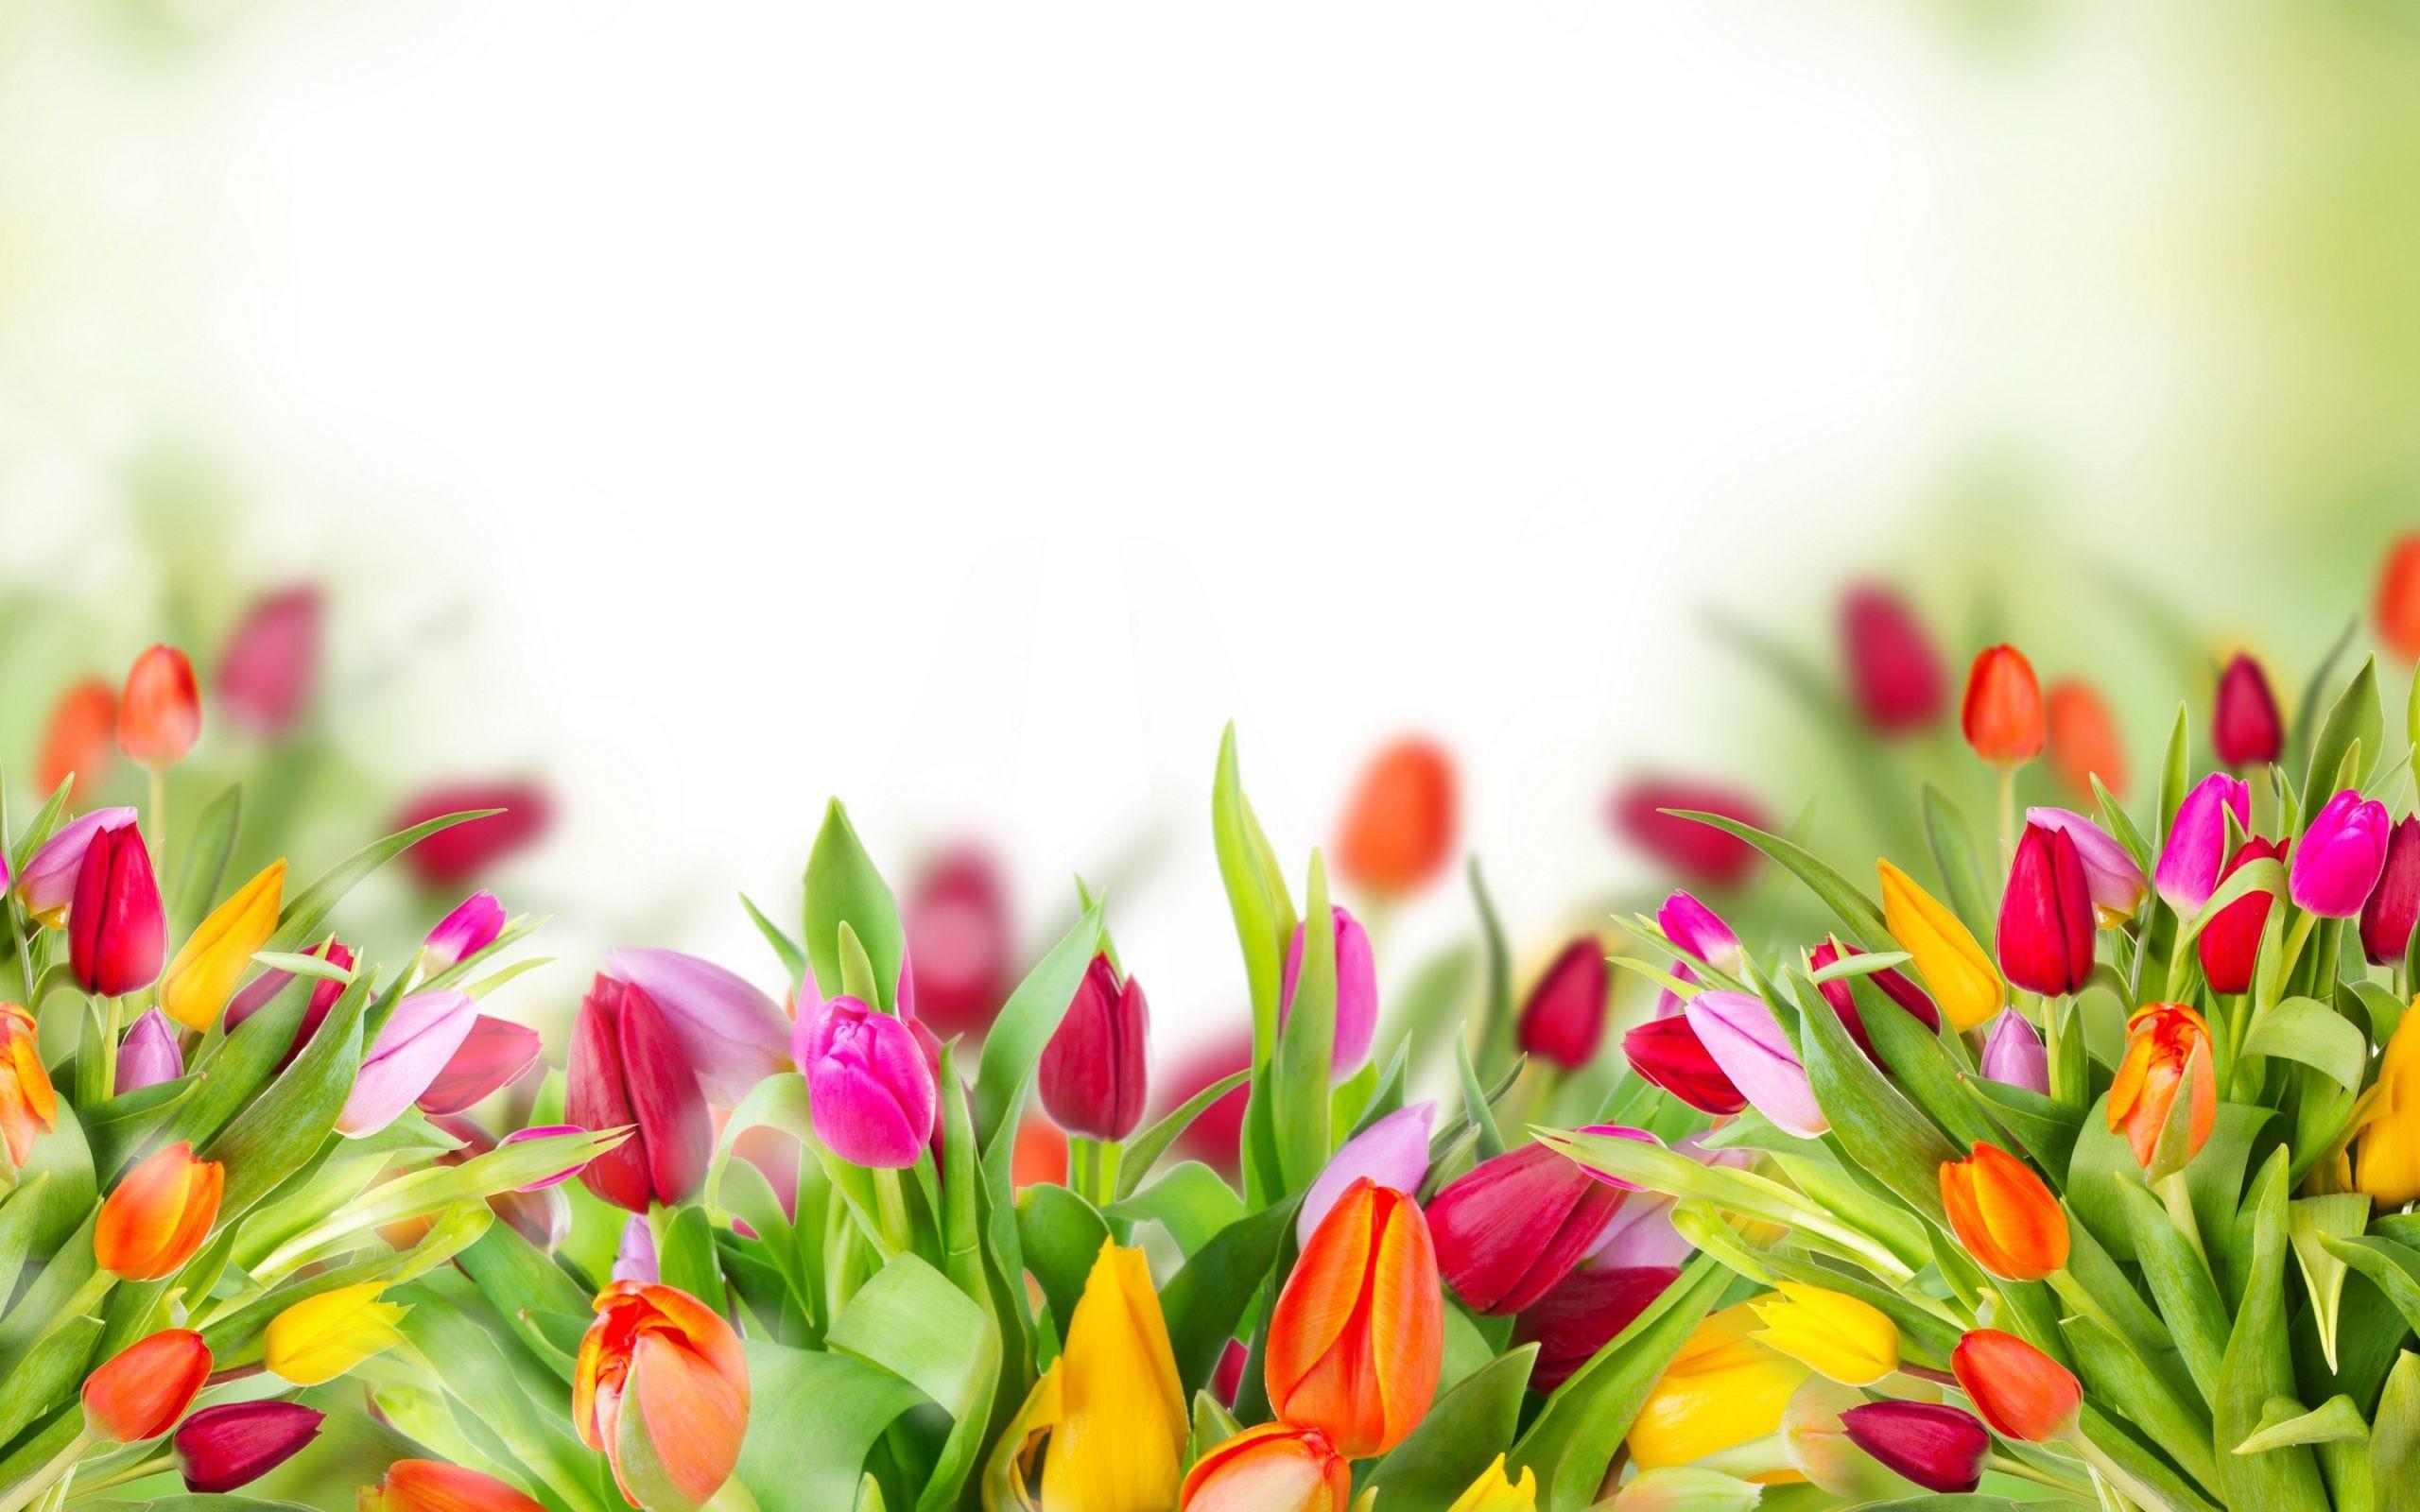 2560x1600, Tulip Flower Wallpapers For Desktop Background - Tulip Flower Wallpapers For Desktop Background - HD Wallpaper